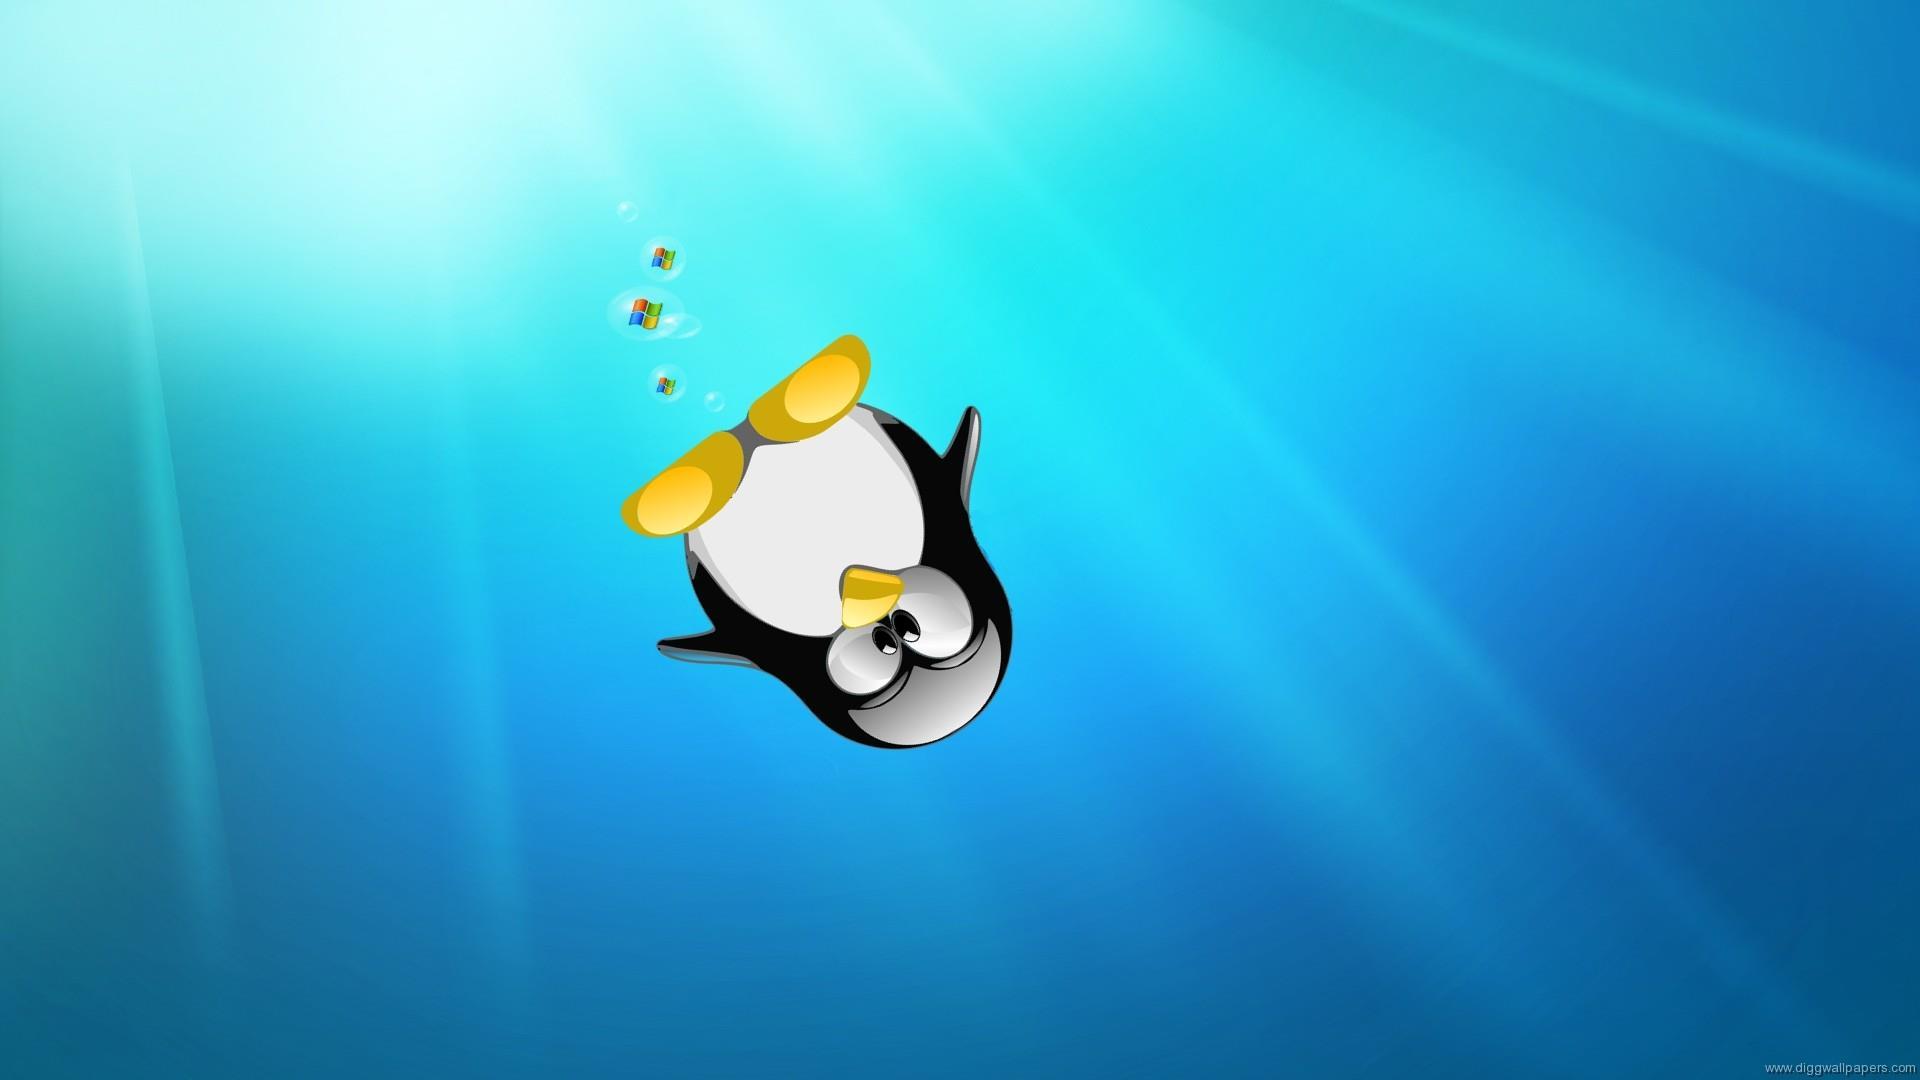 linux-ubuntu-wallpaper-OS-free-tux-le-manchot_4